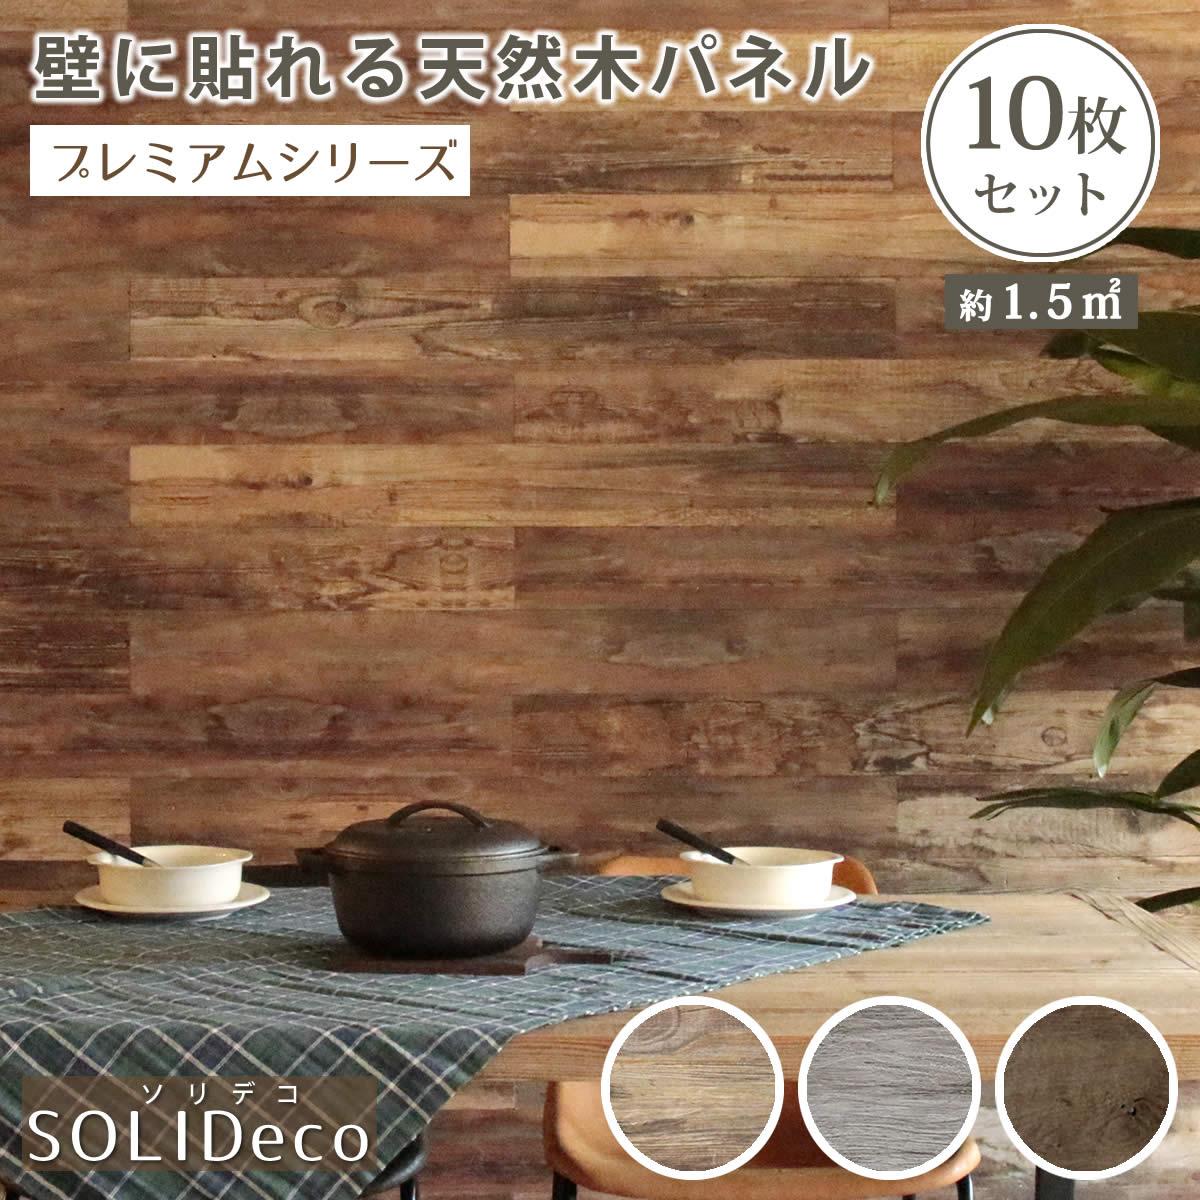 SOLIDECO 壁に貼れる天然木パネル 10枚組(約1.5m2)【送料無料 壁パネル ウォールパネル ウッドパネル DIY 壁紙】